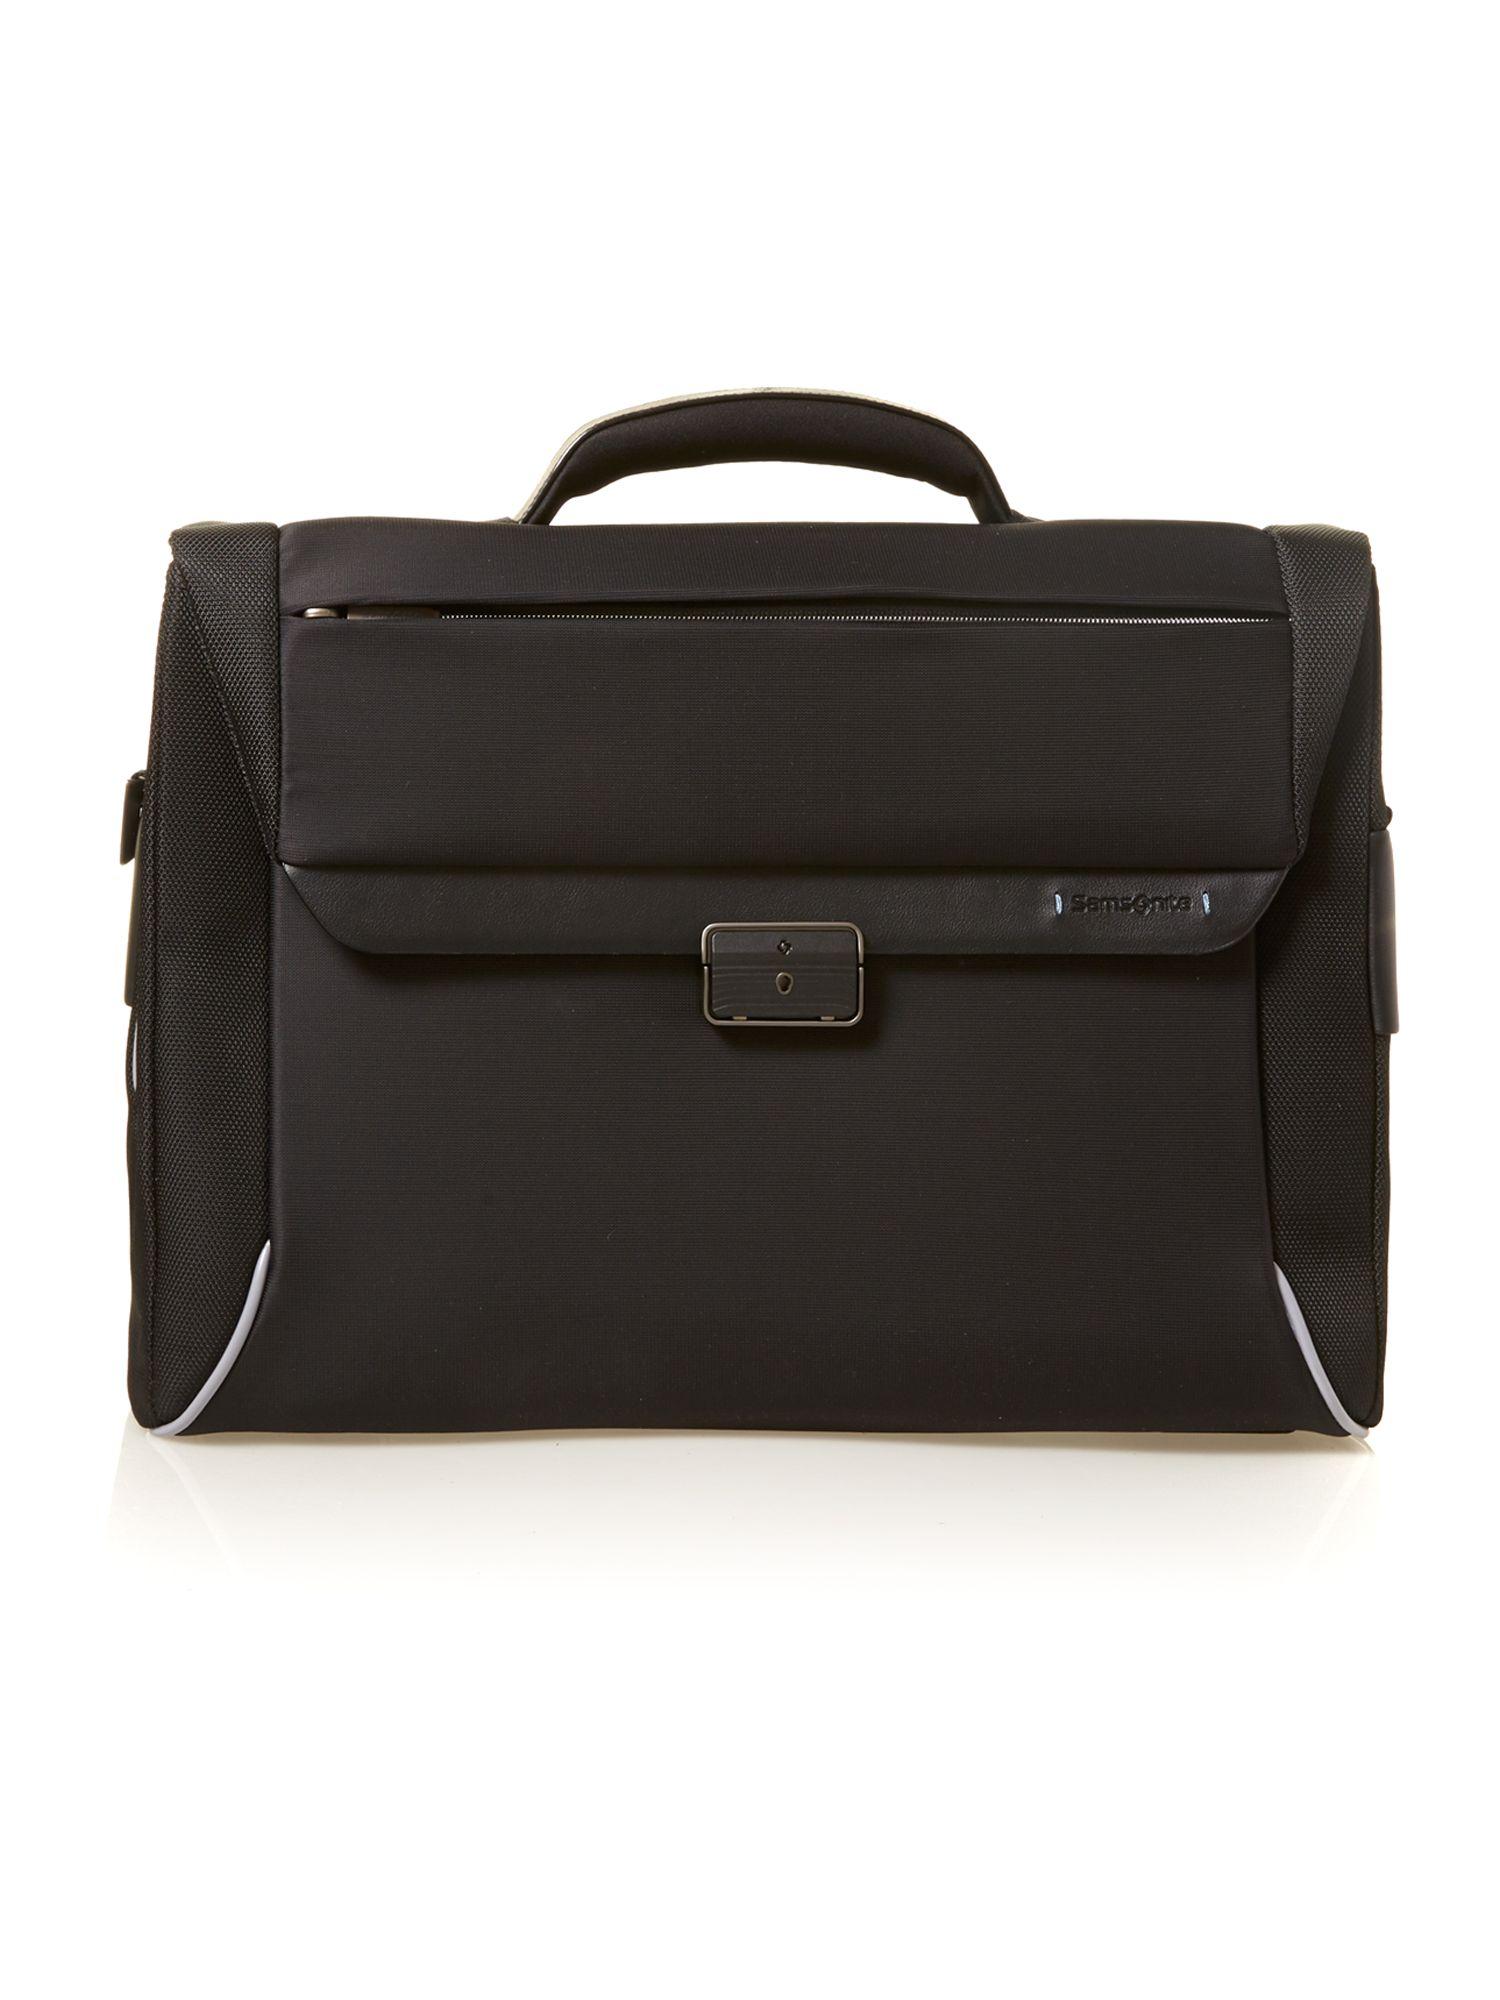 Samsonite Spectrolite Briefcase 2 Gussets 16 in Black for ...